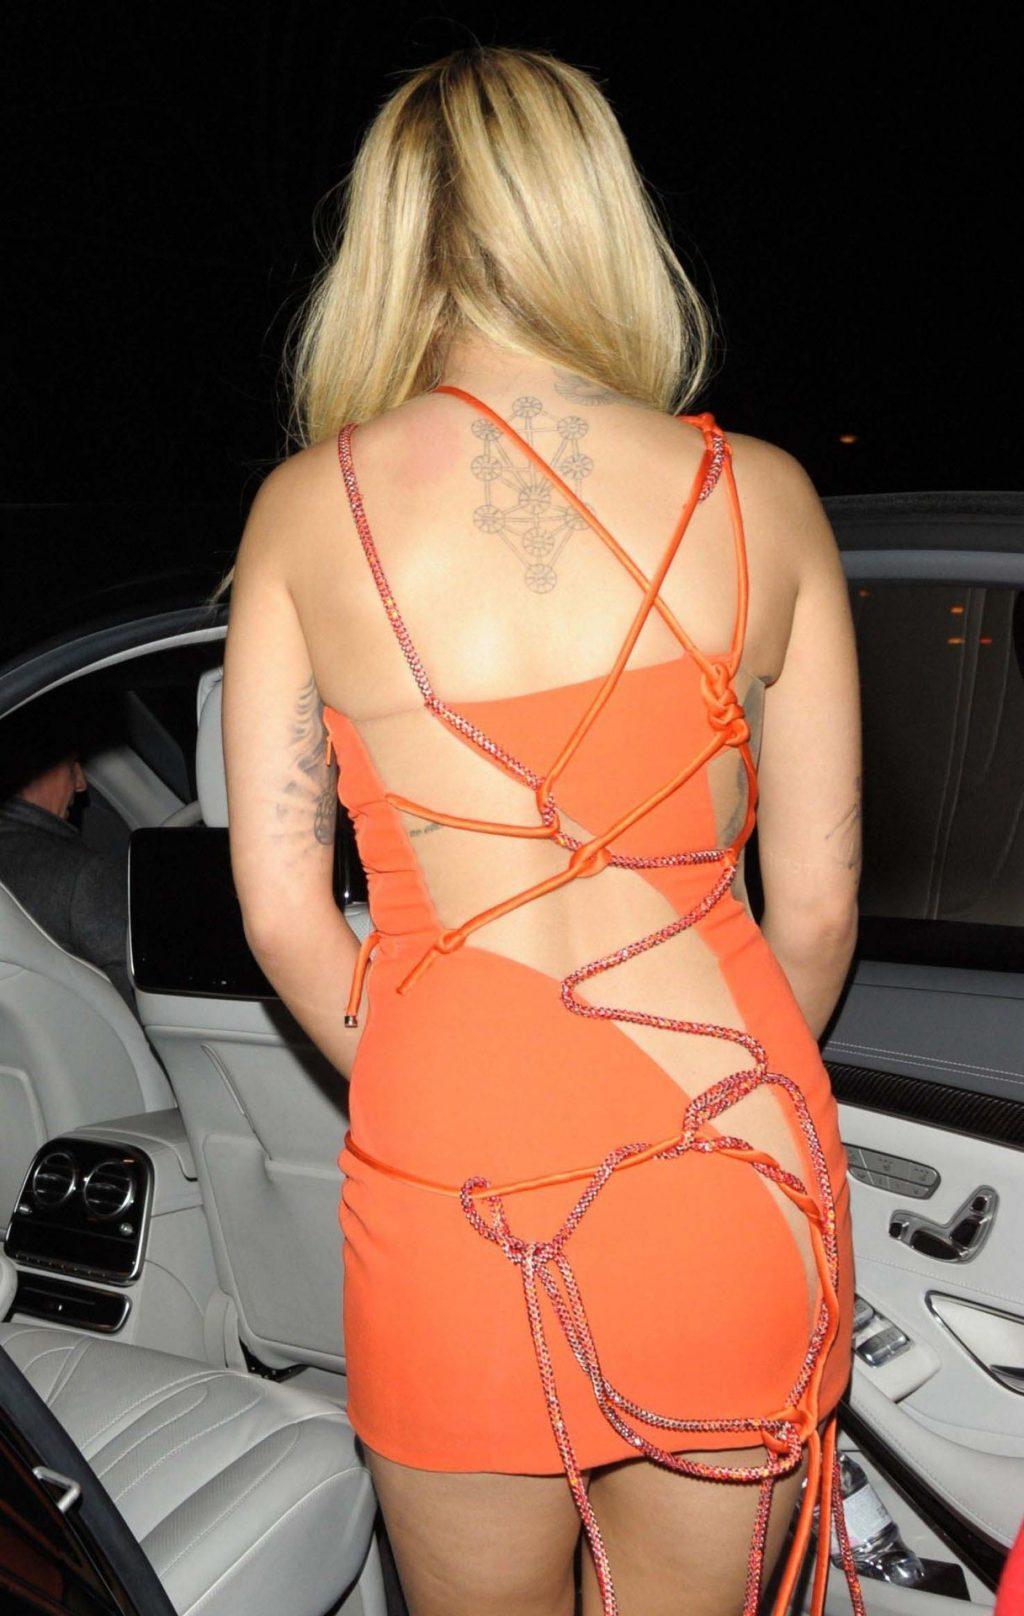 Rita Ora Pantyless (59 Photos)